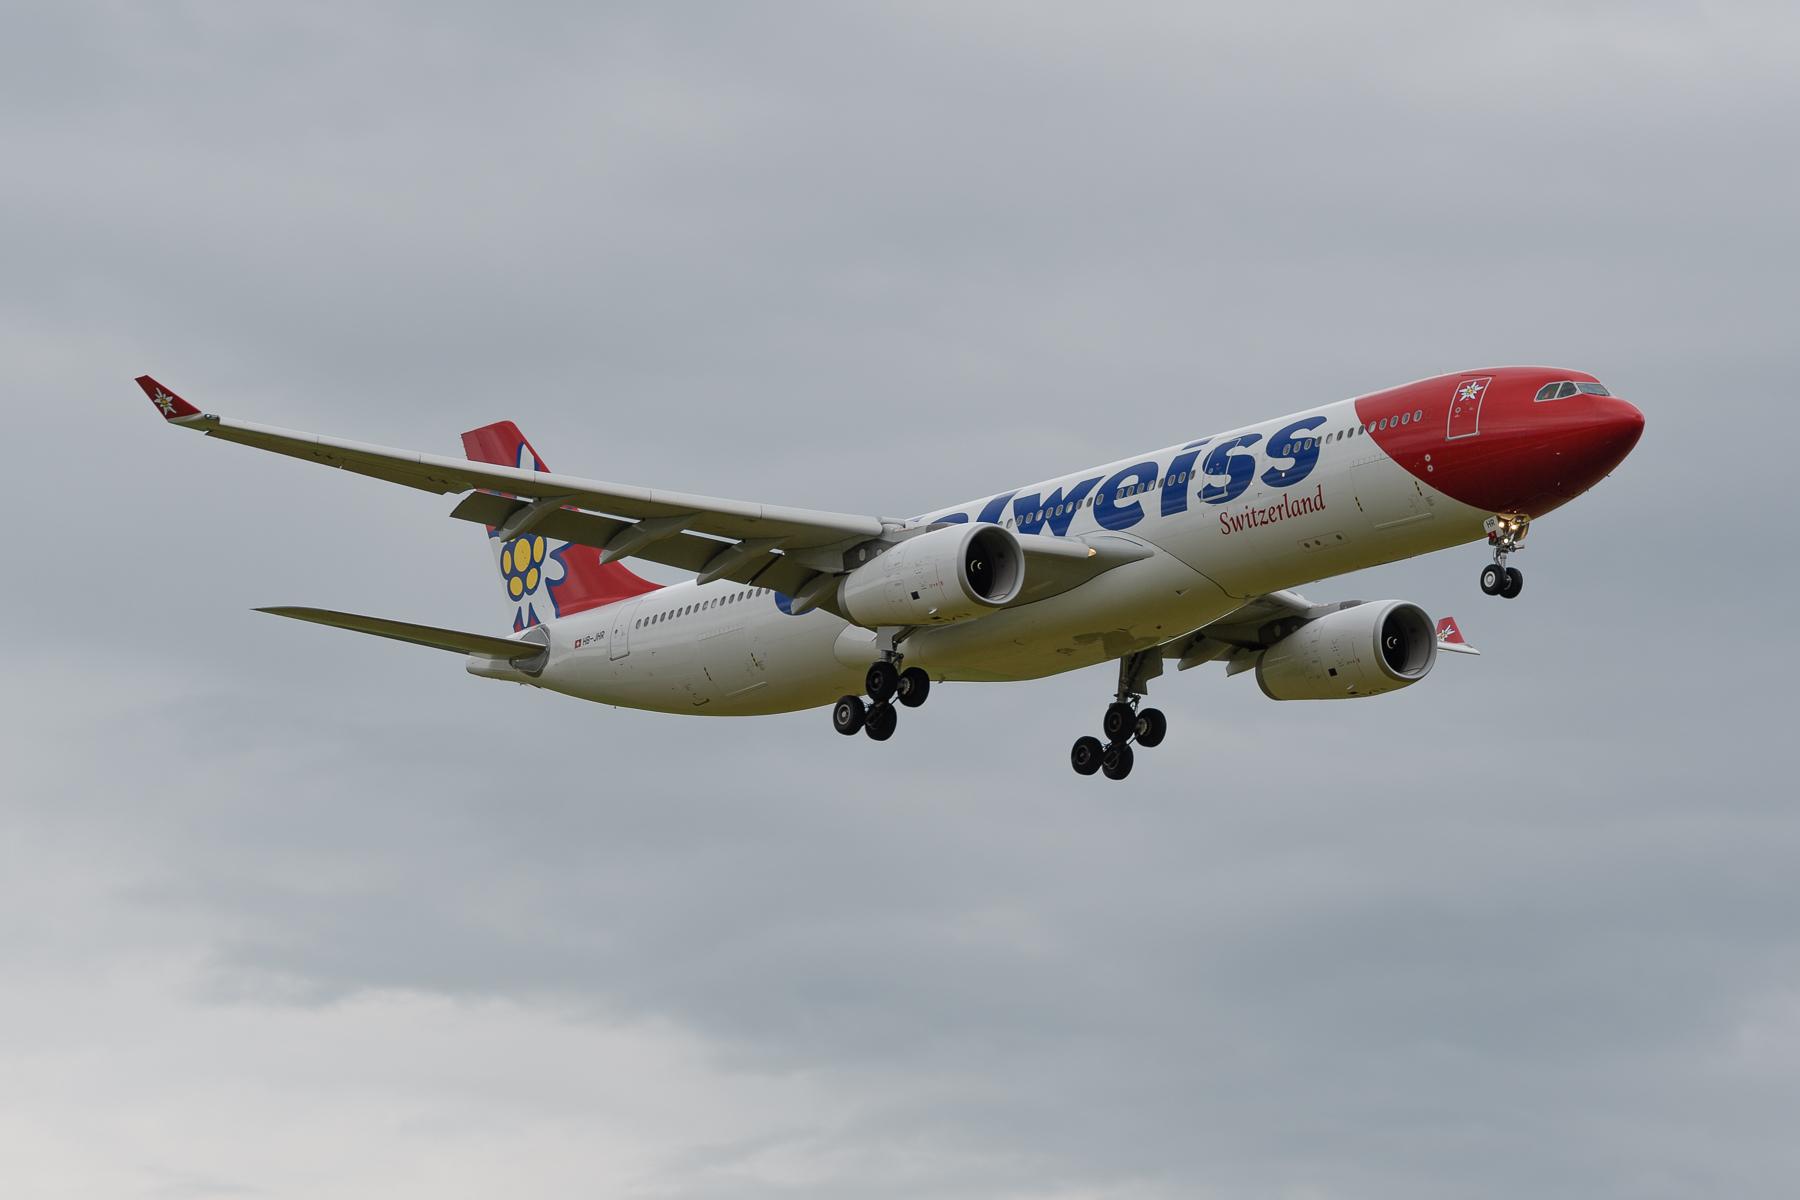 Landungen Runway 14 Flughafen Zürich-Kloten